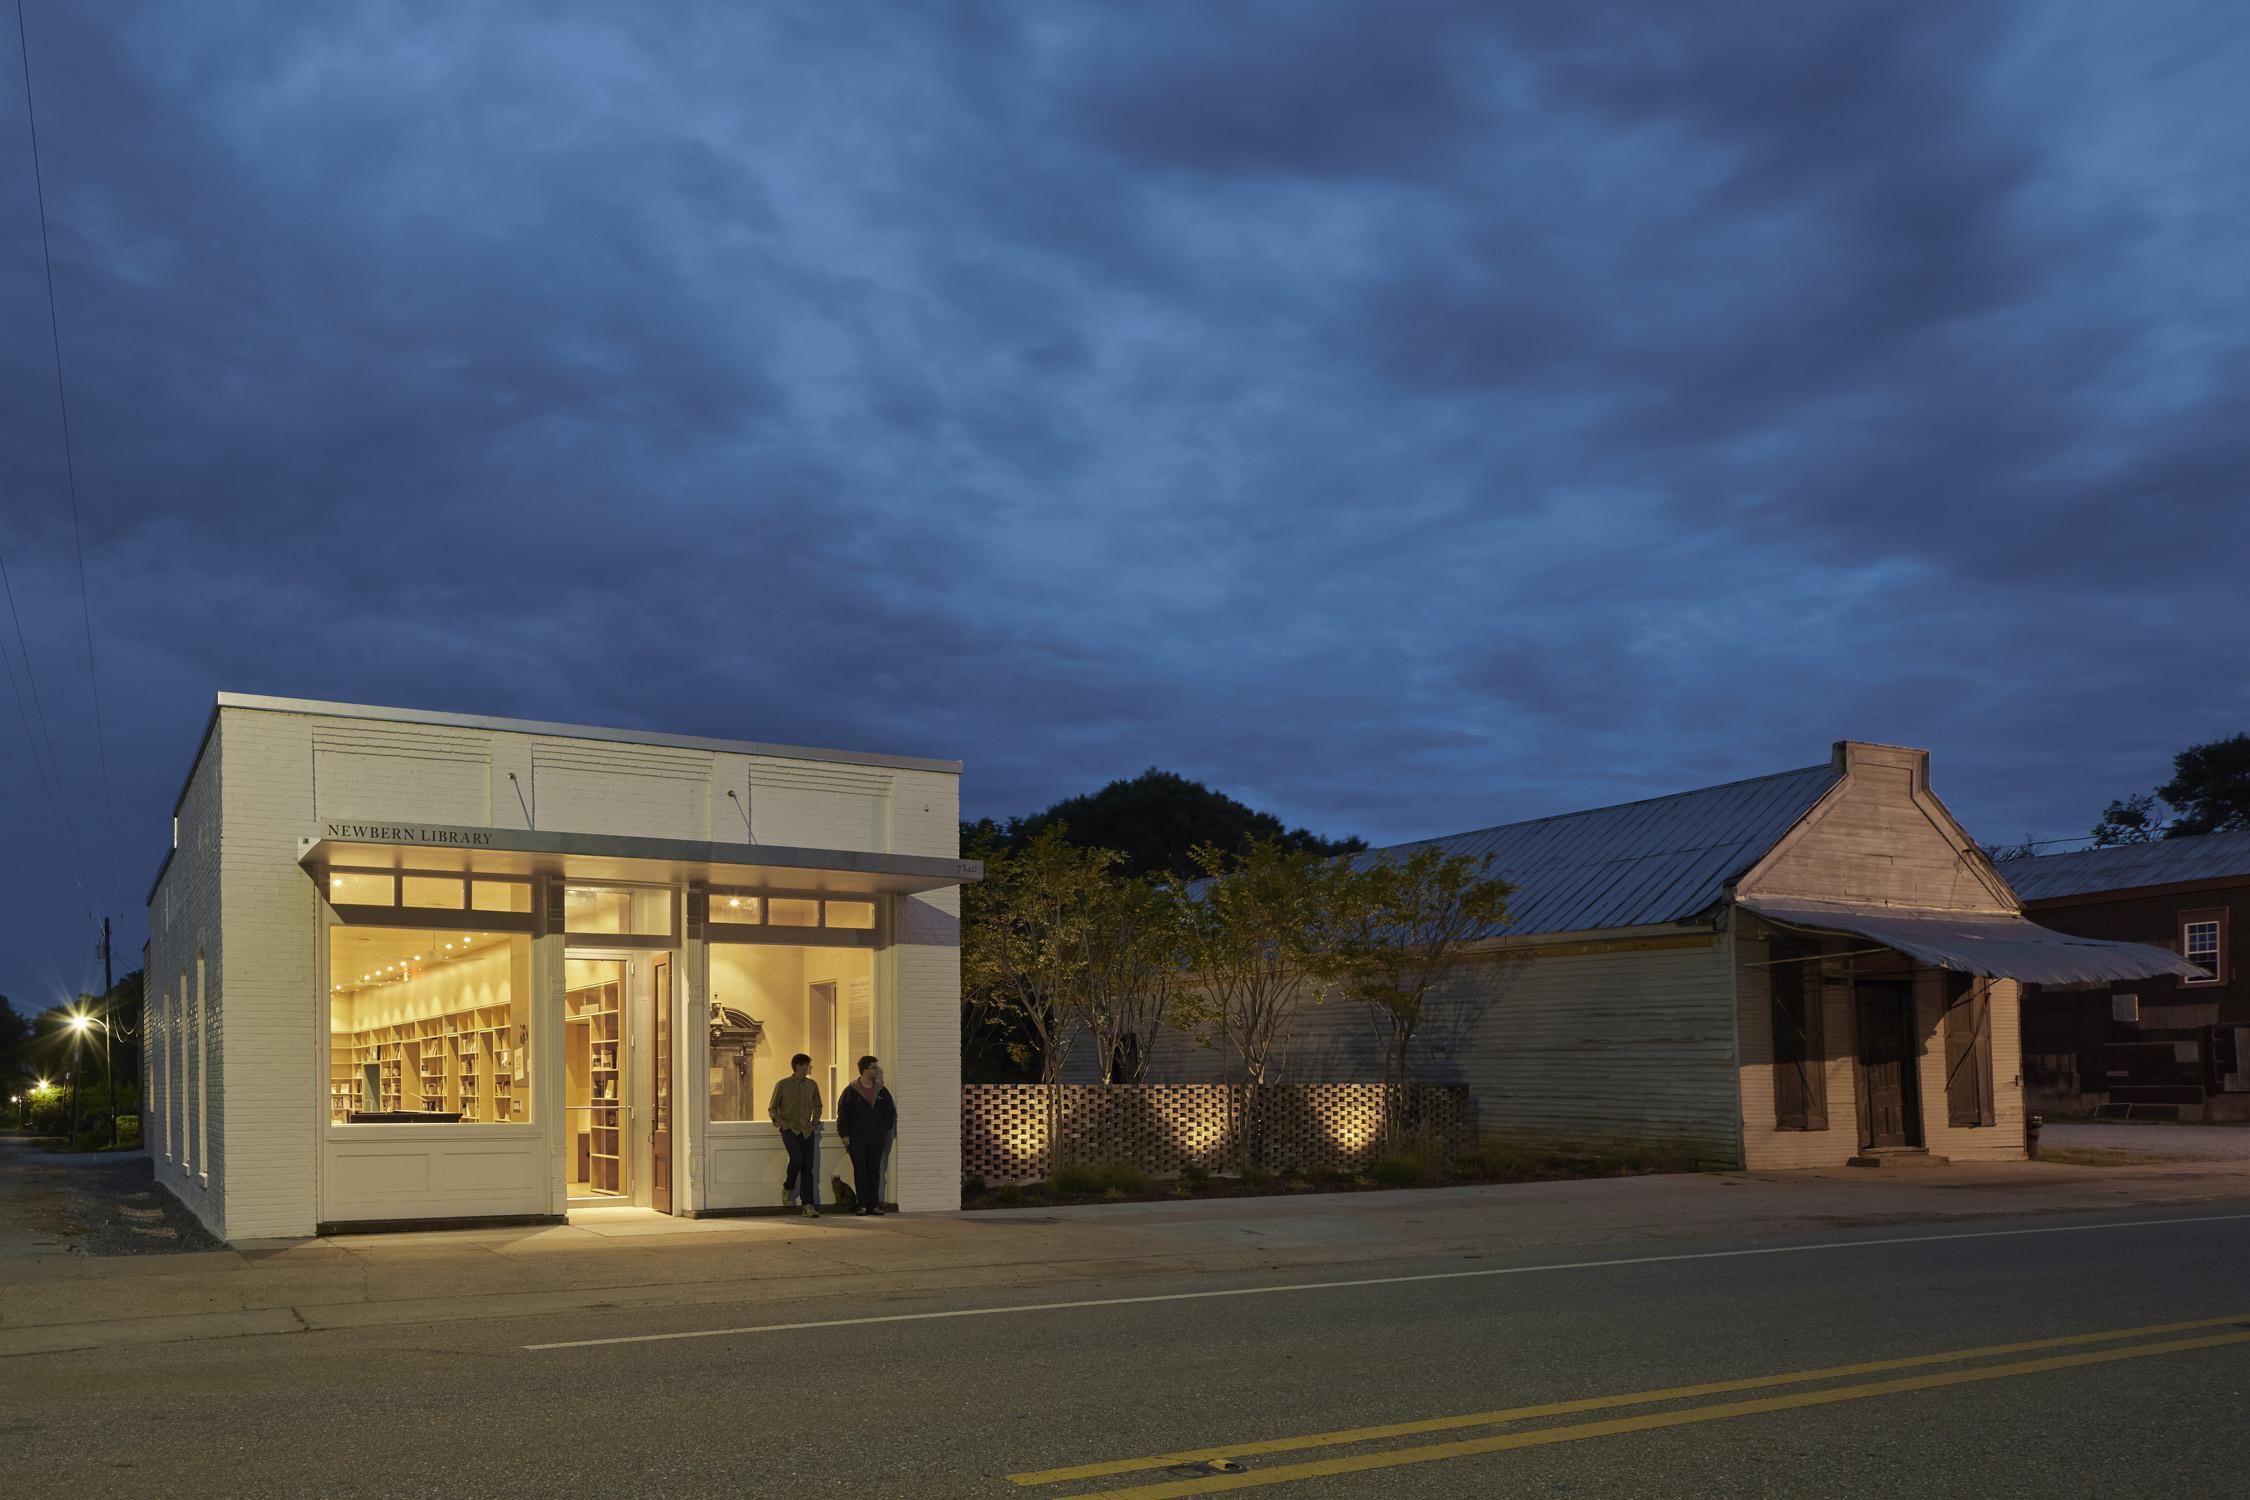 Newbern Library exterior